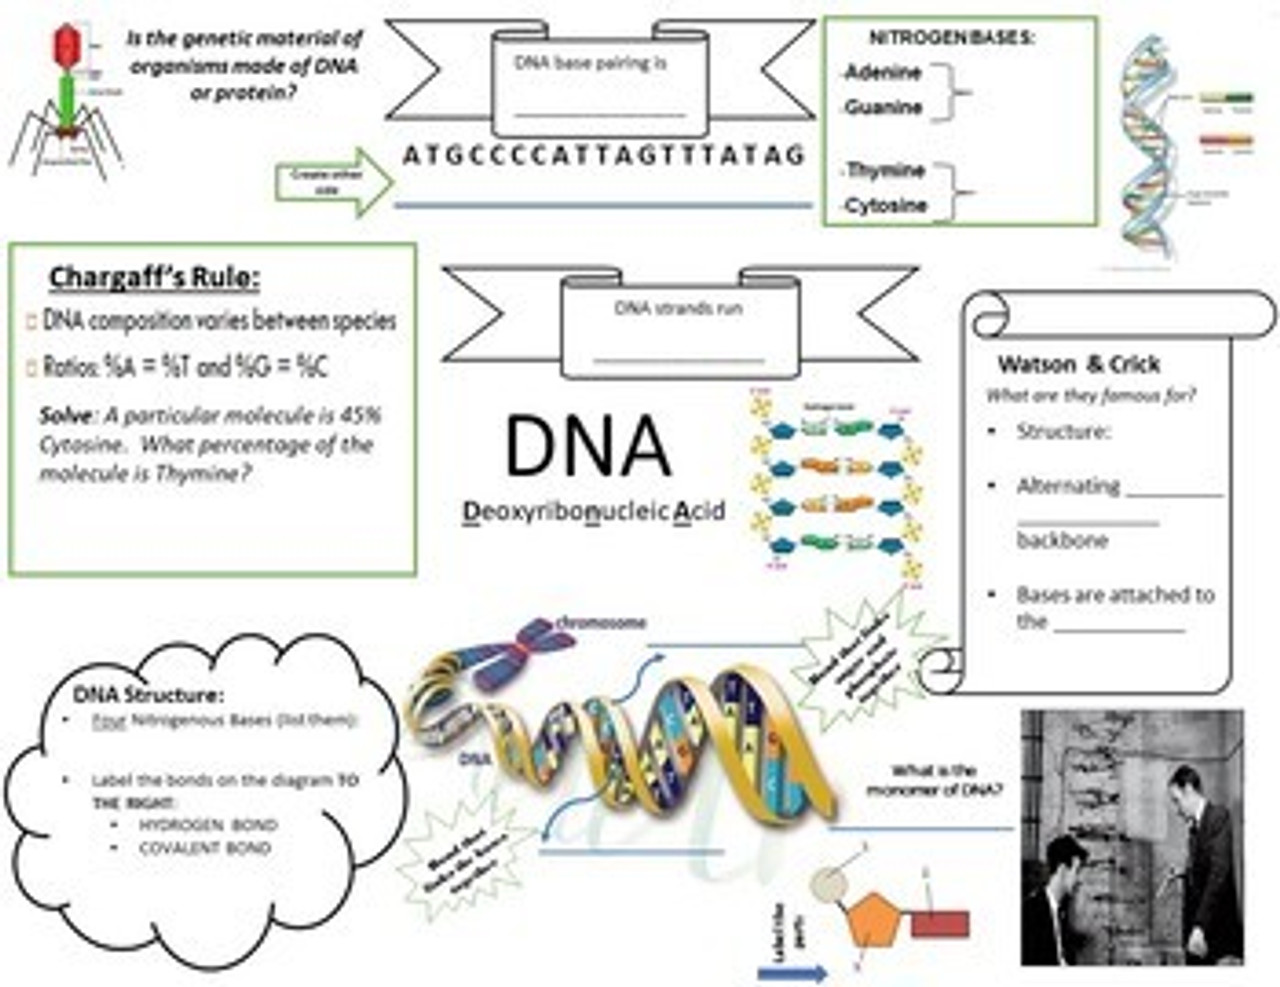 DNA Structure Interactive Doodle Handout